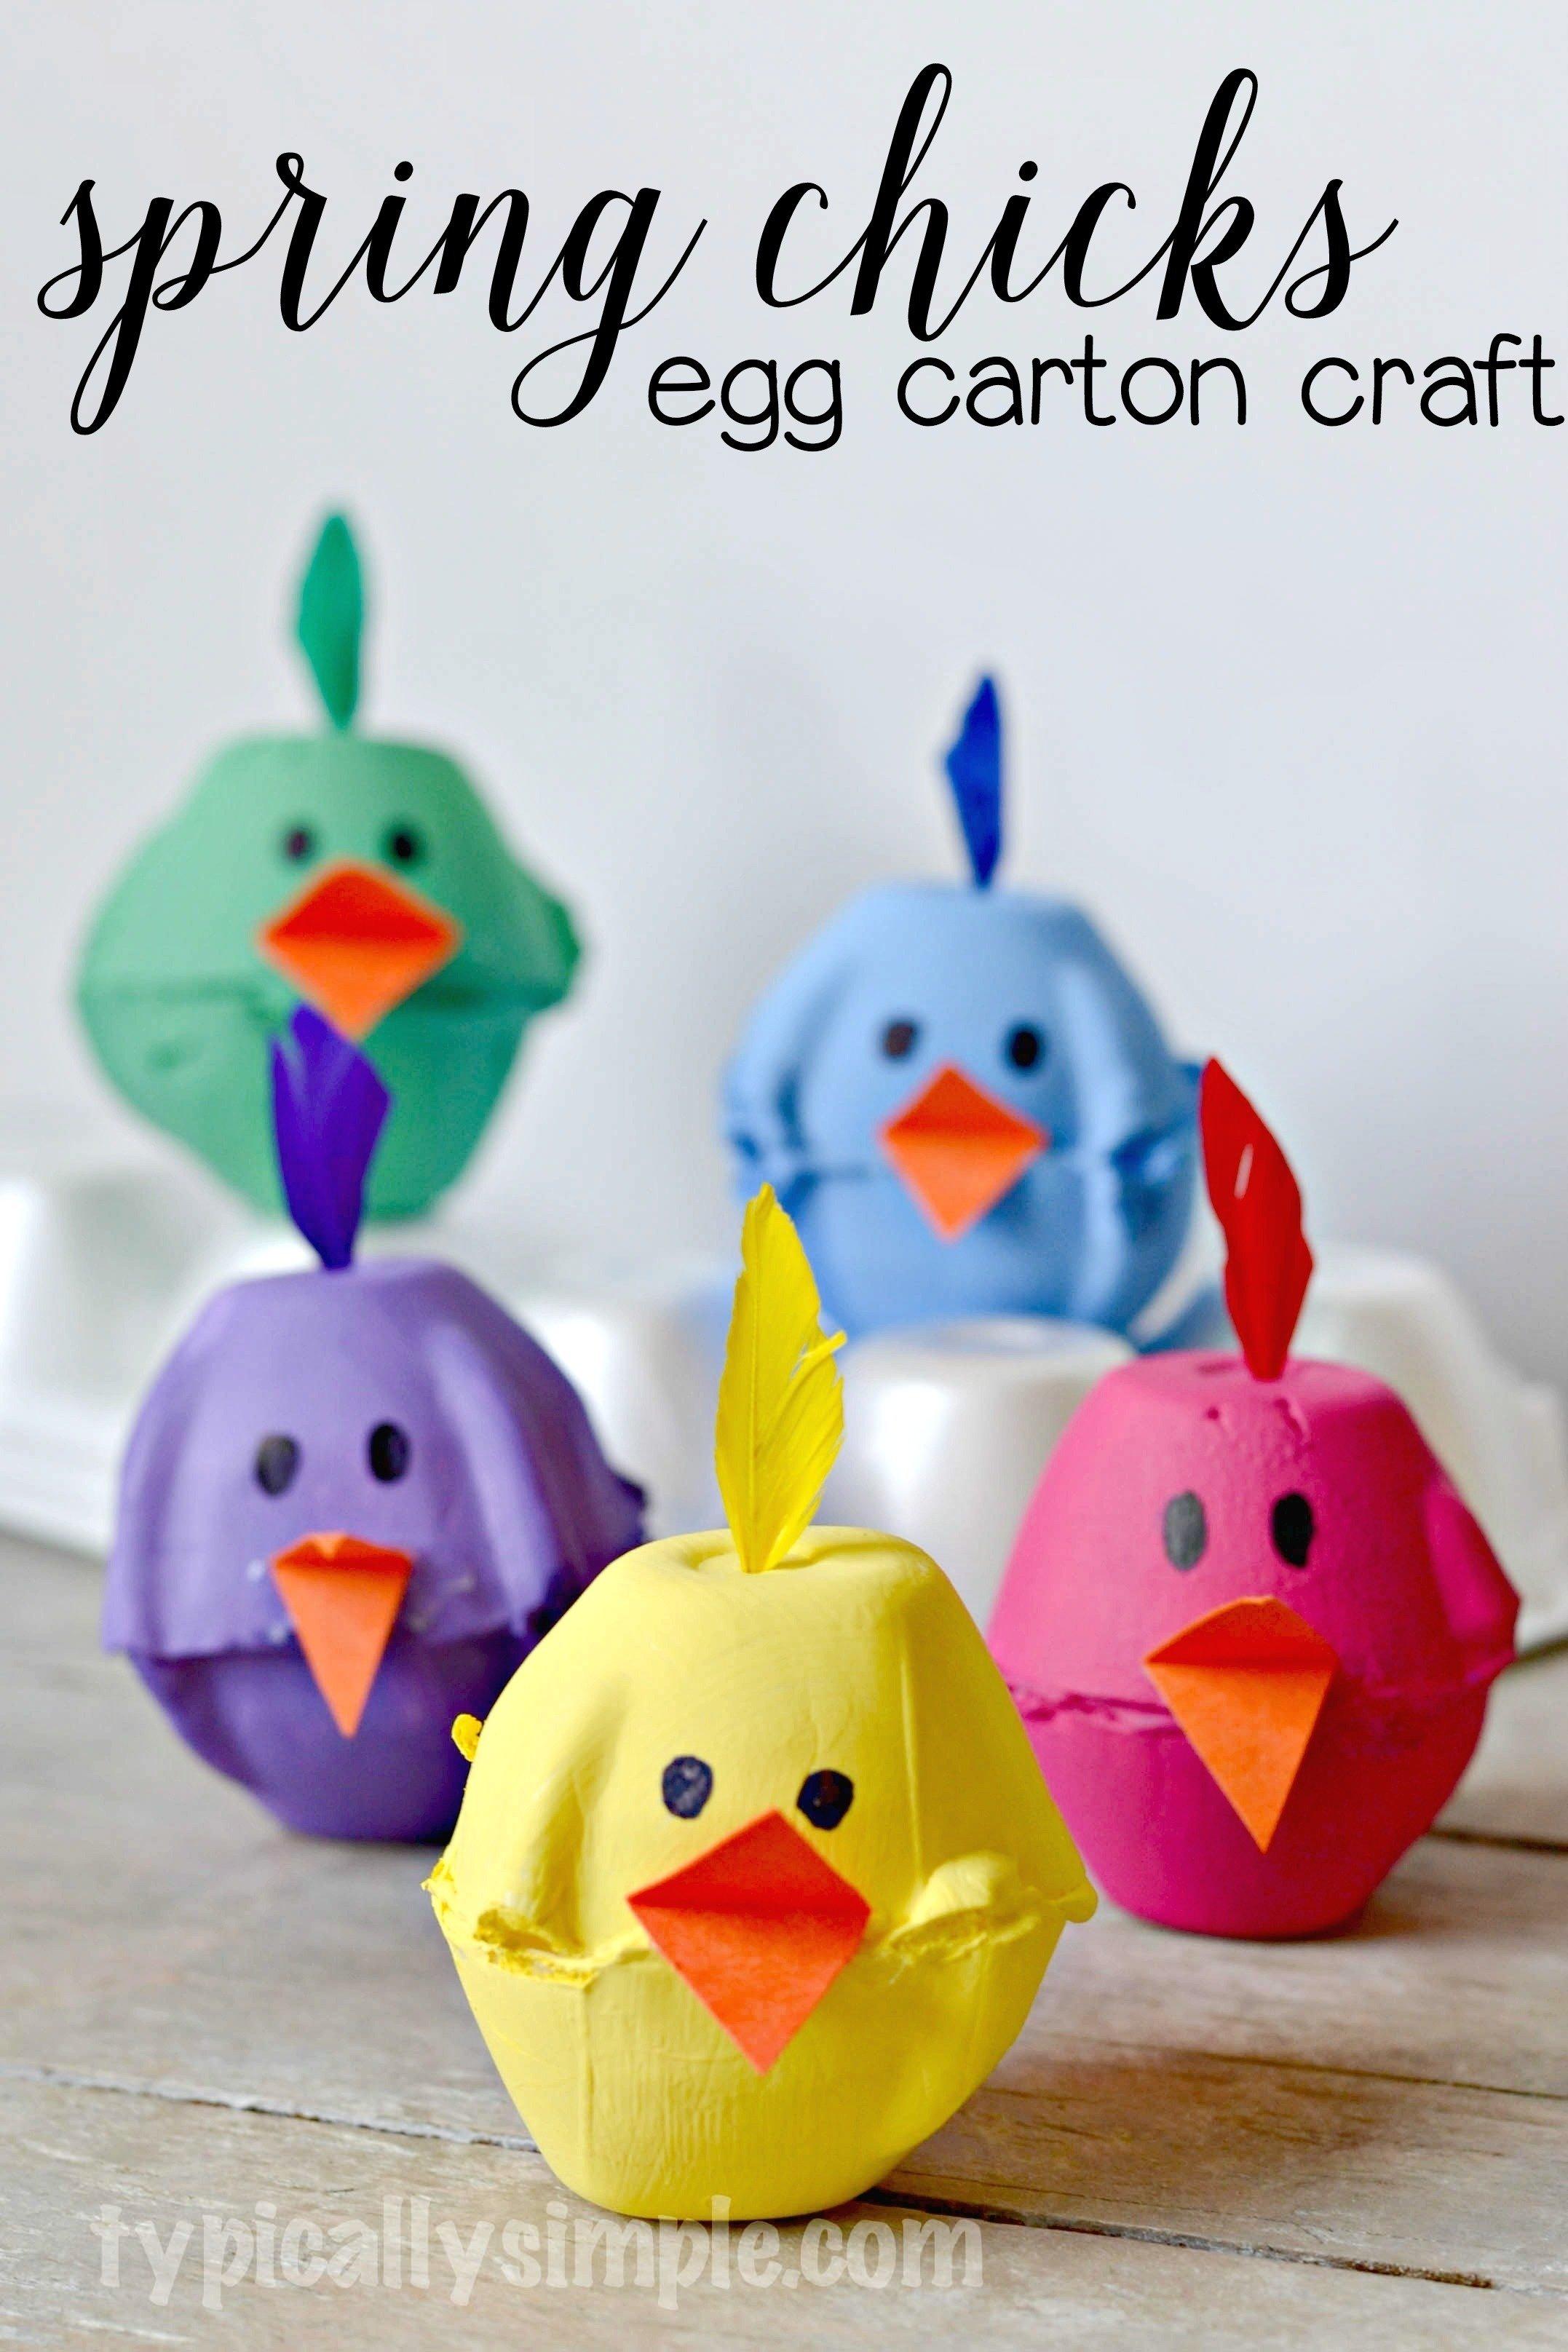 10 Unique Easter Craft Ideas For Preschoolers easter craft activity ideas ye craft ideas 2020